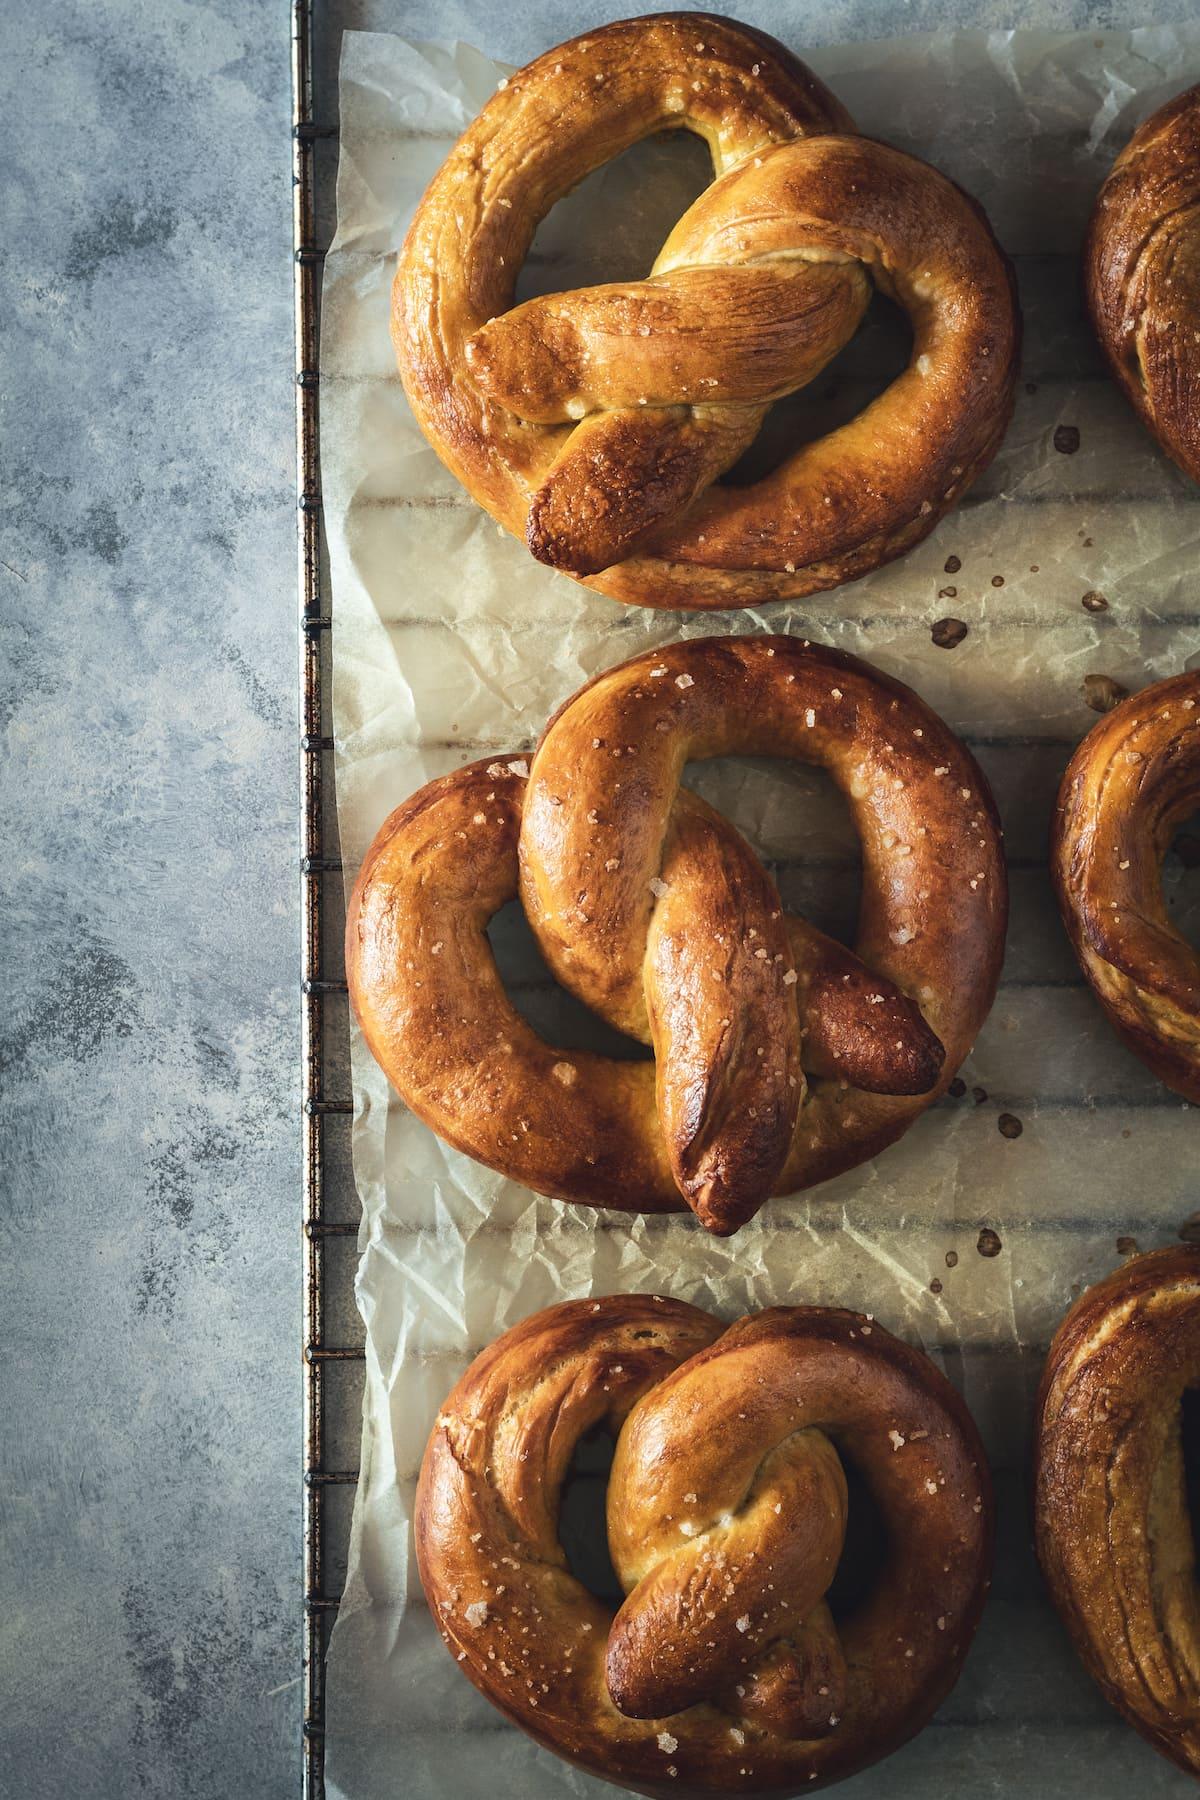 3 golden-brown pretzels.